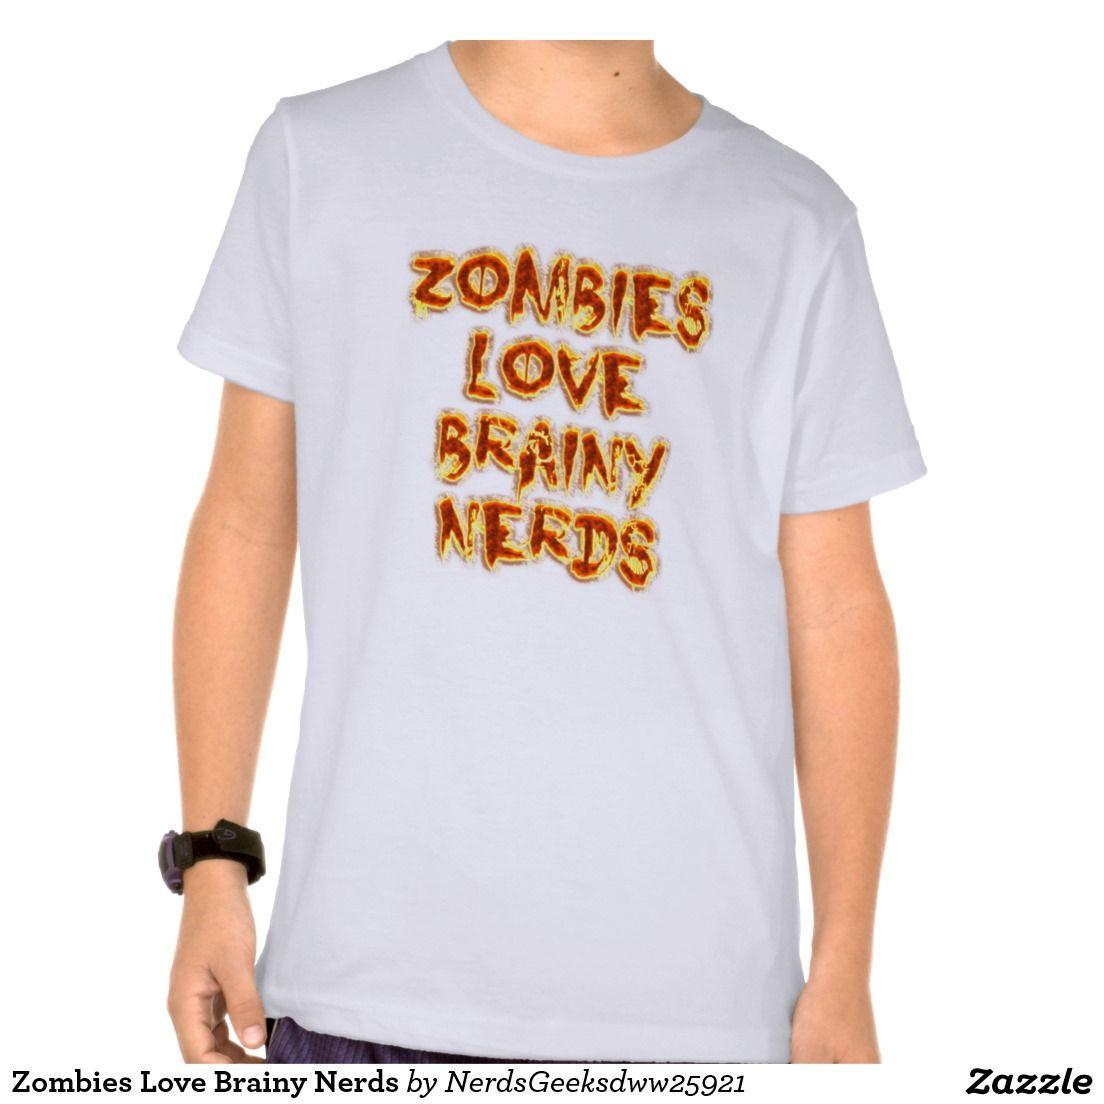 f7fc7333d Zombies Love Brainy Nerds Tshirt #Nerd #Geek #Kids #Tee #Shirt #Gift  #School #Customize #Zazzle